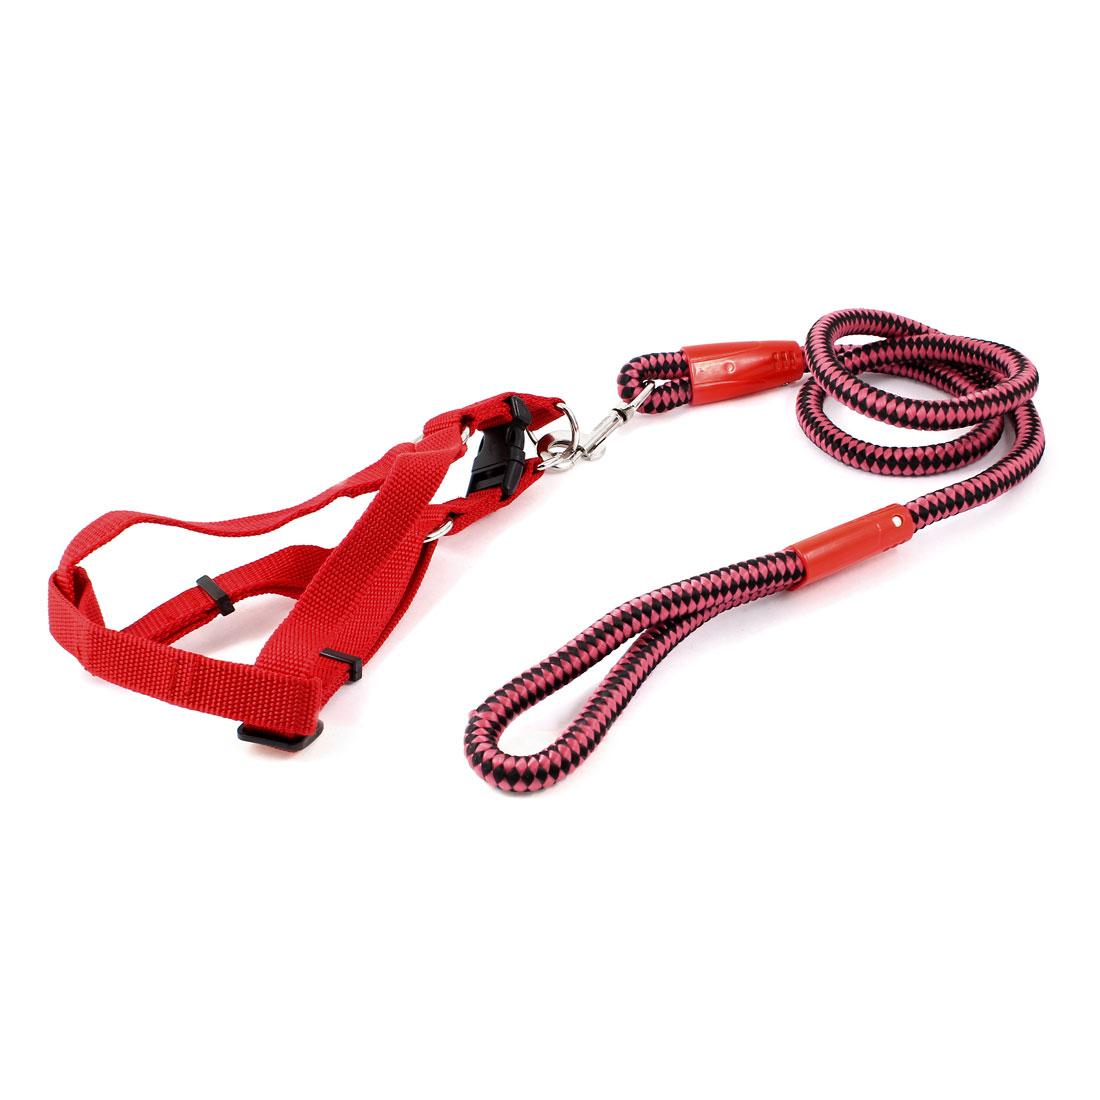 Trigger Hook Nylon Rope Lead Pet Dog Yorkie Adjustable Harness Leash Black Red